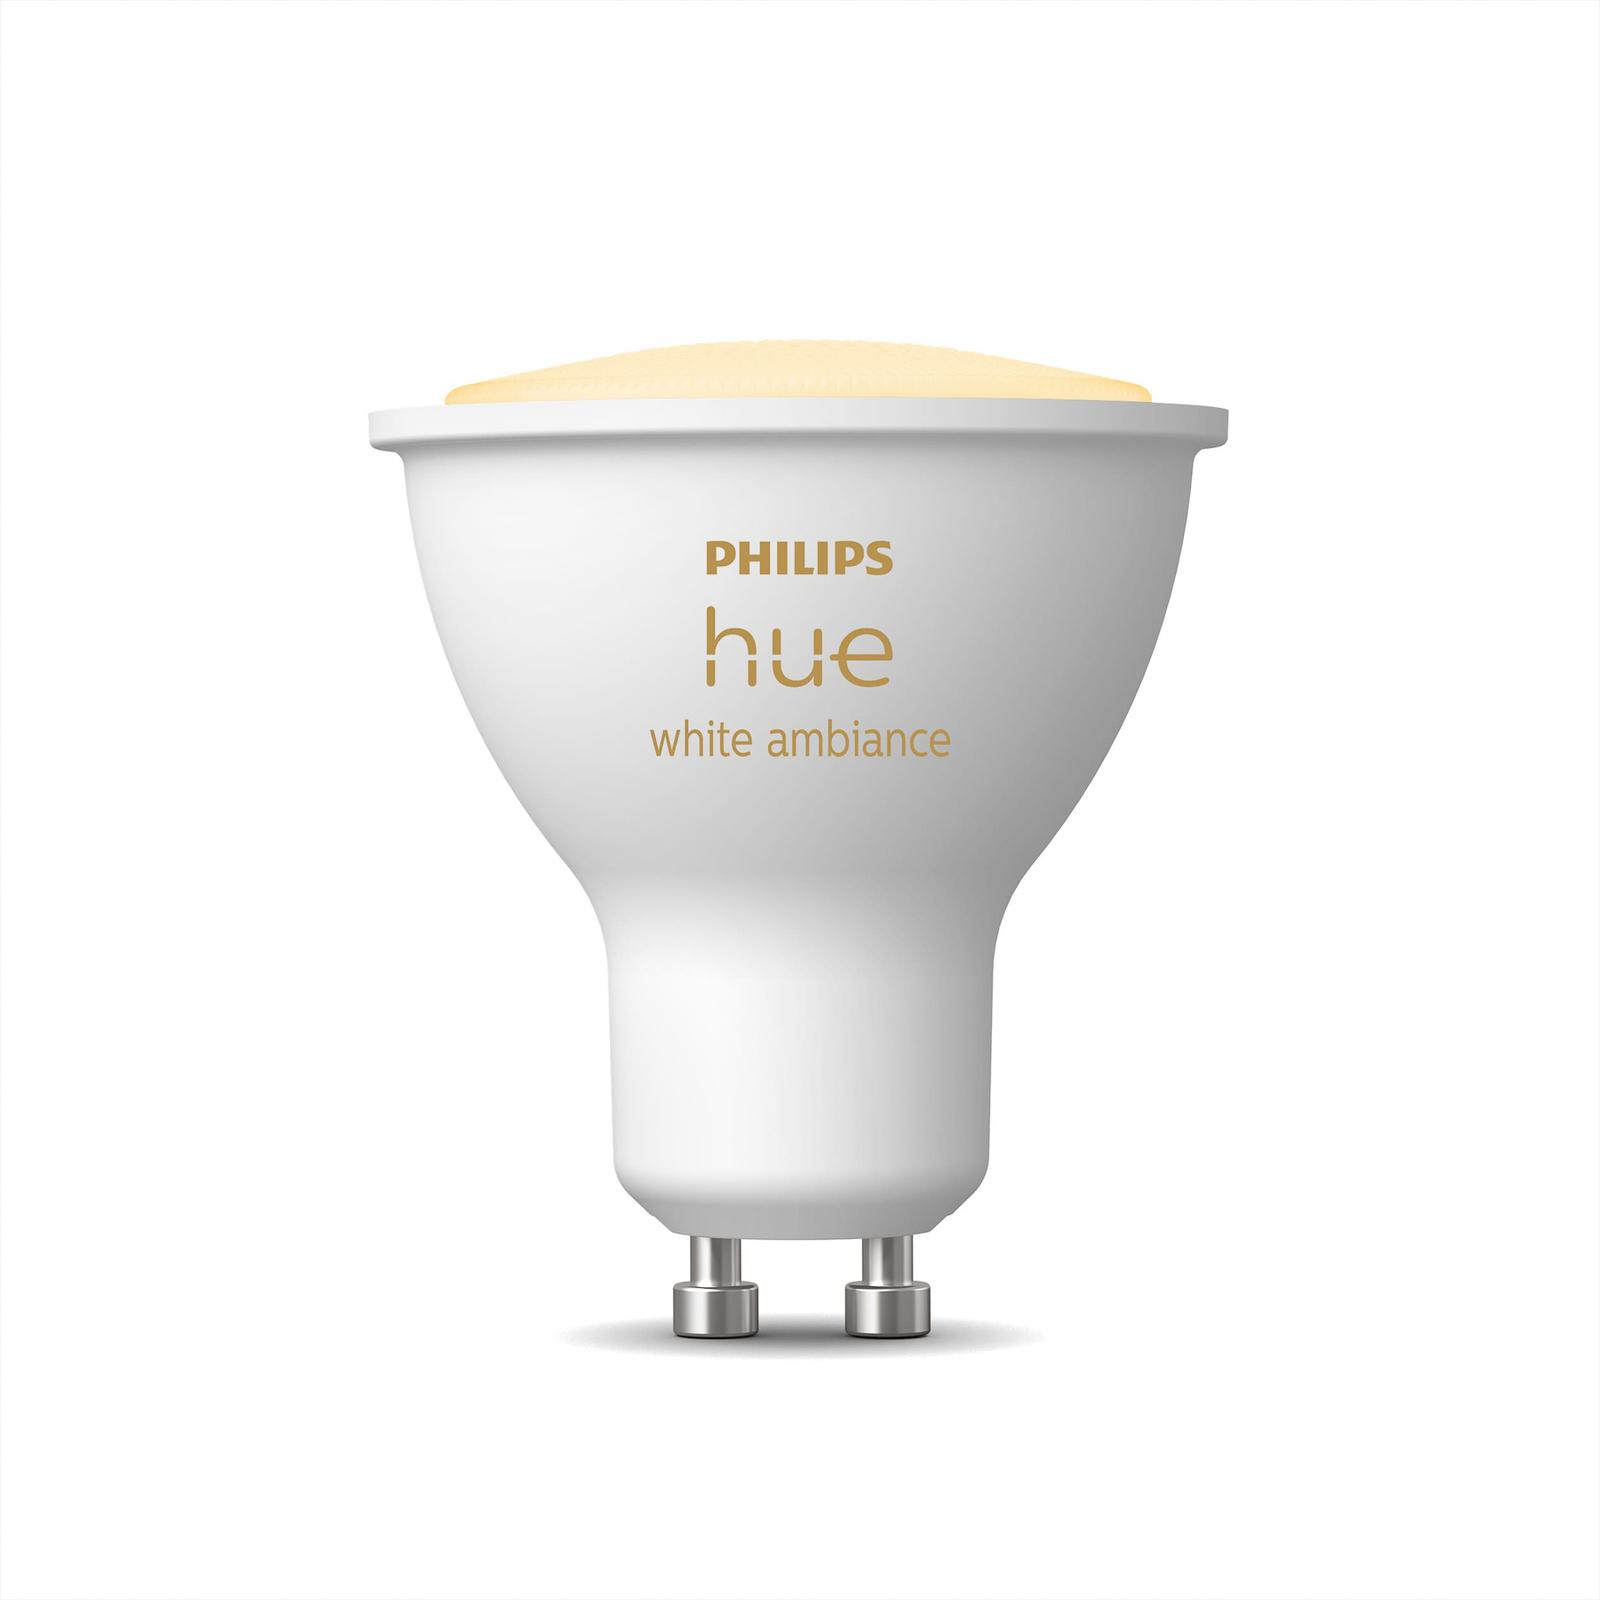 Philips Hue White Ambiance 5 W GU10 LED-pære